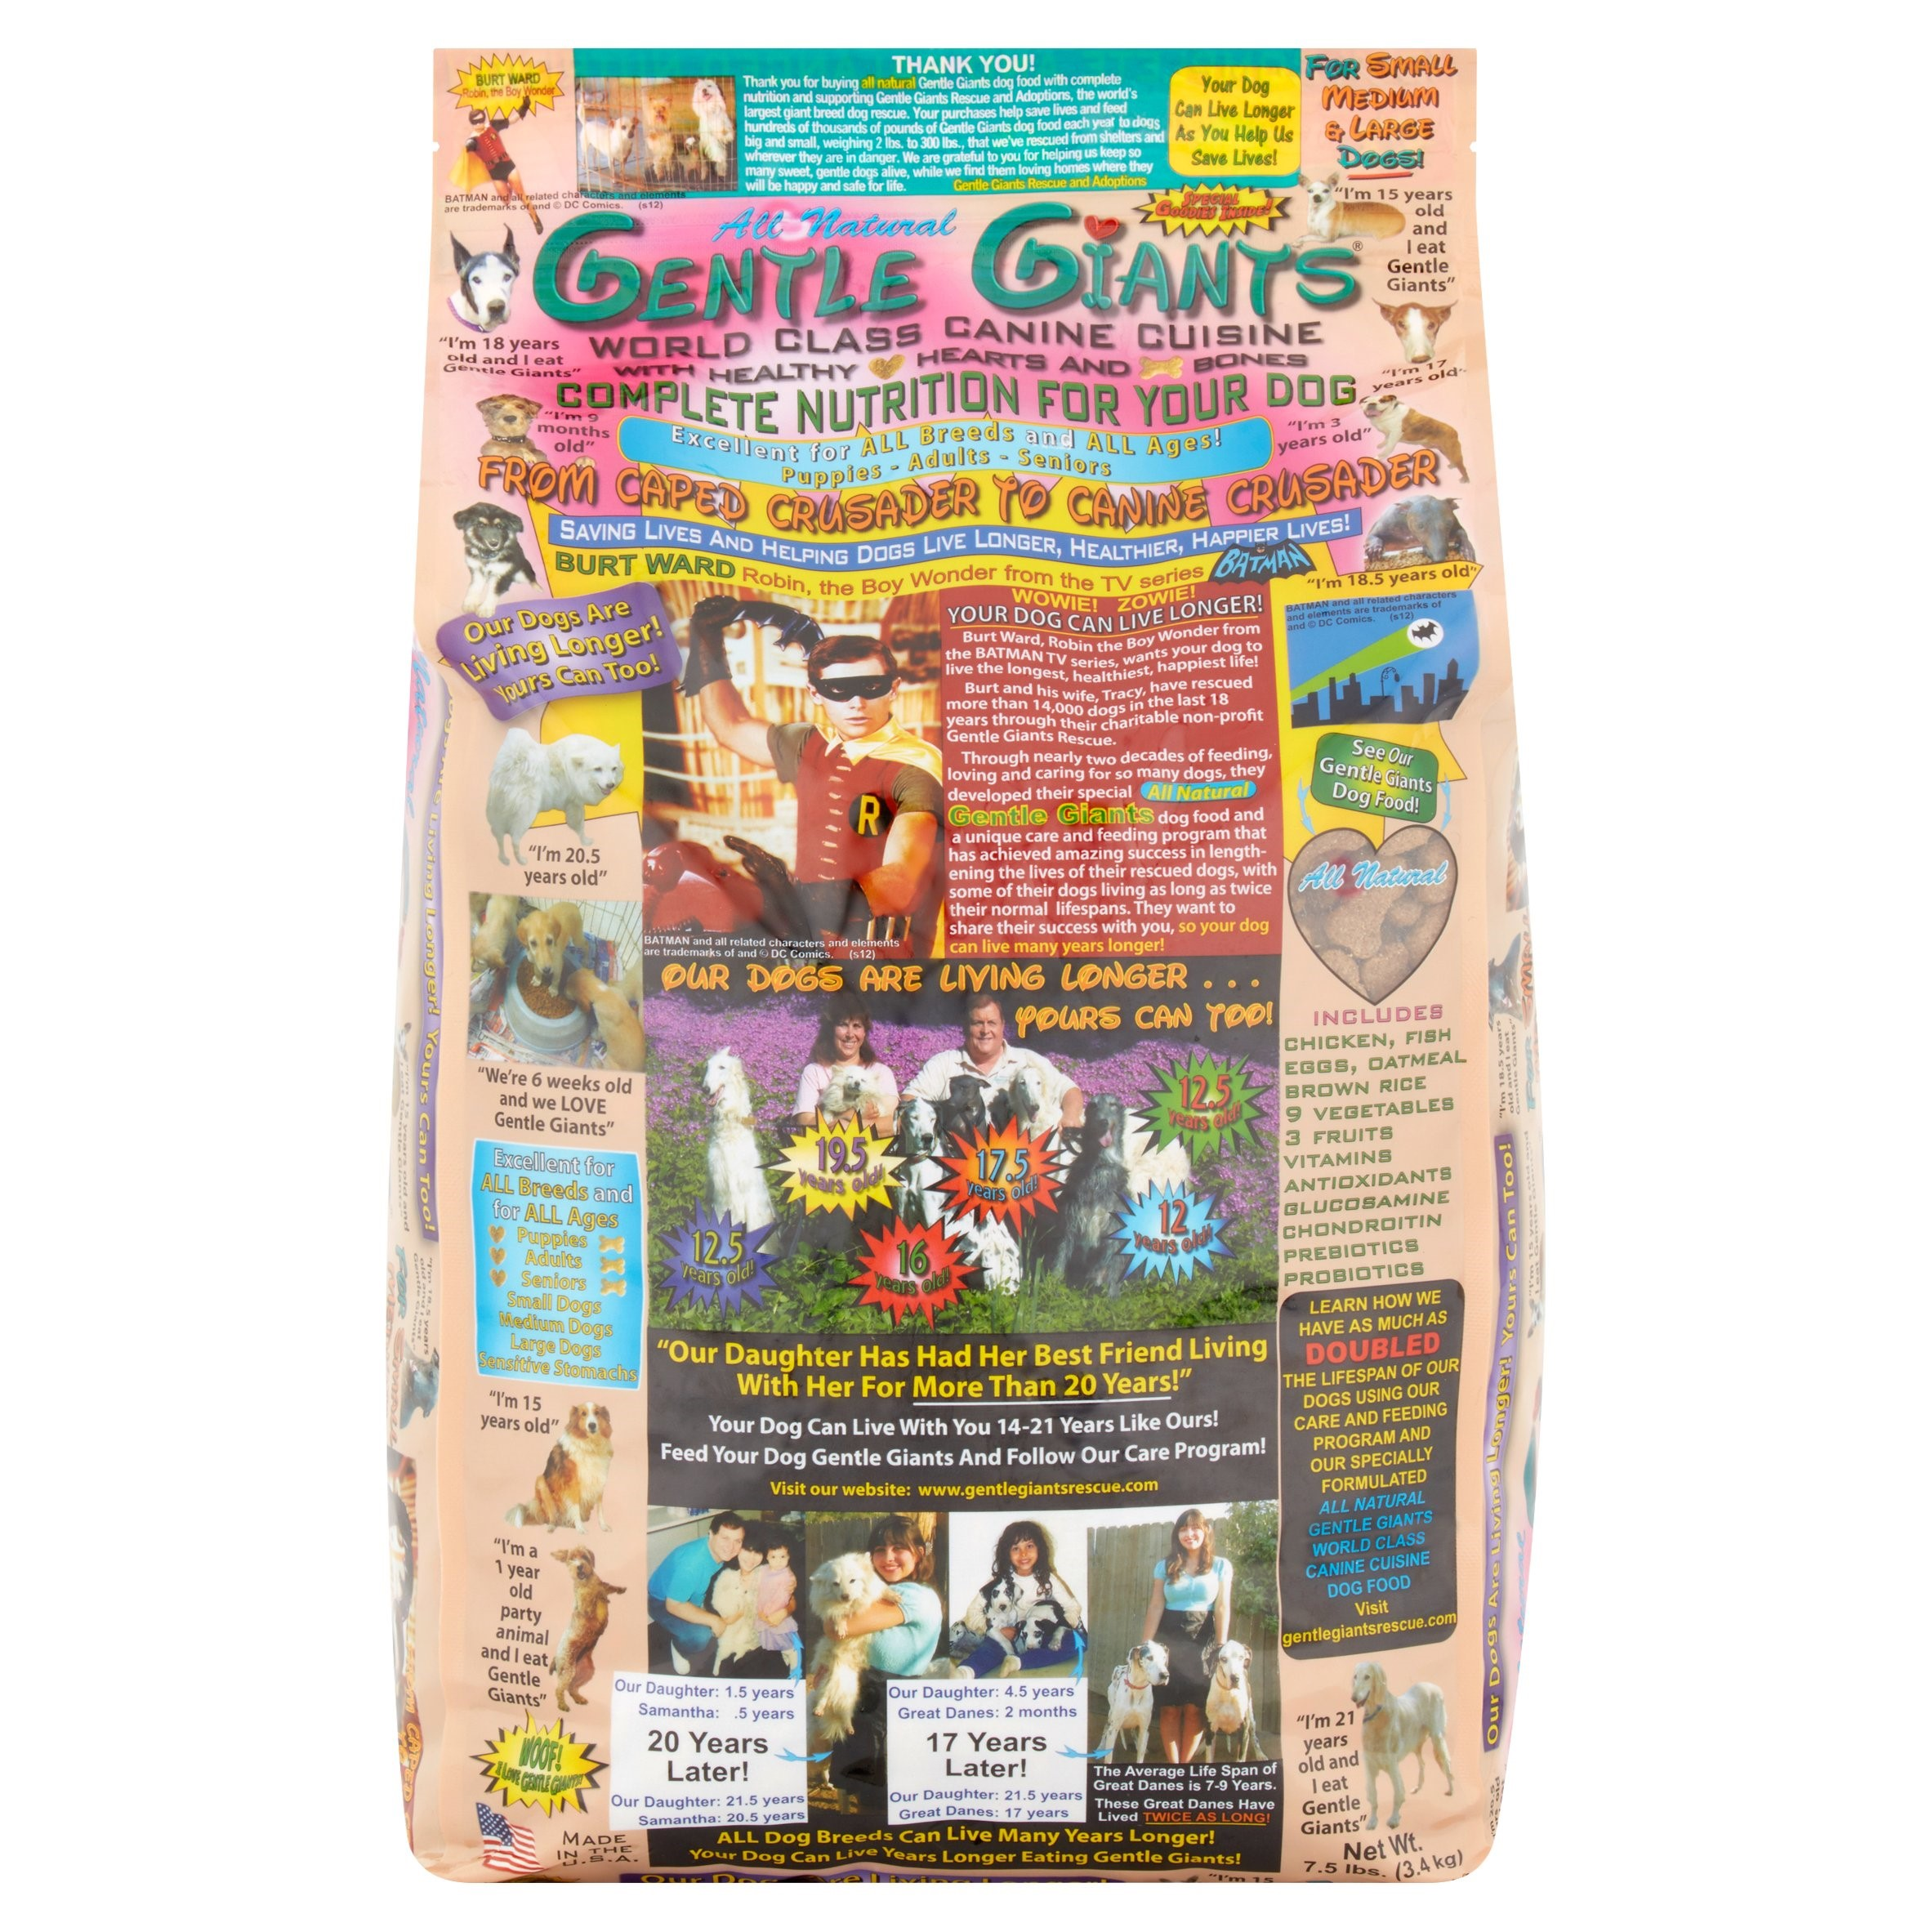 Gentle Giants World Class Canine Cuisine Dog Food, 7.5 lbs